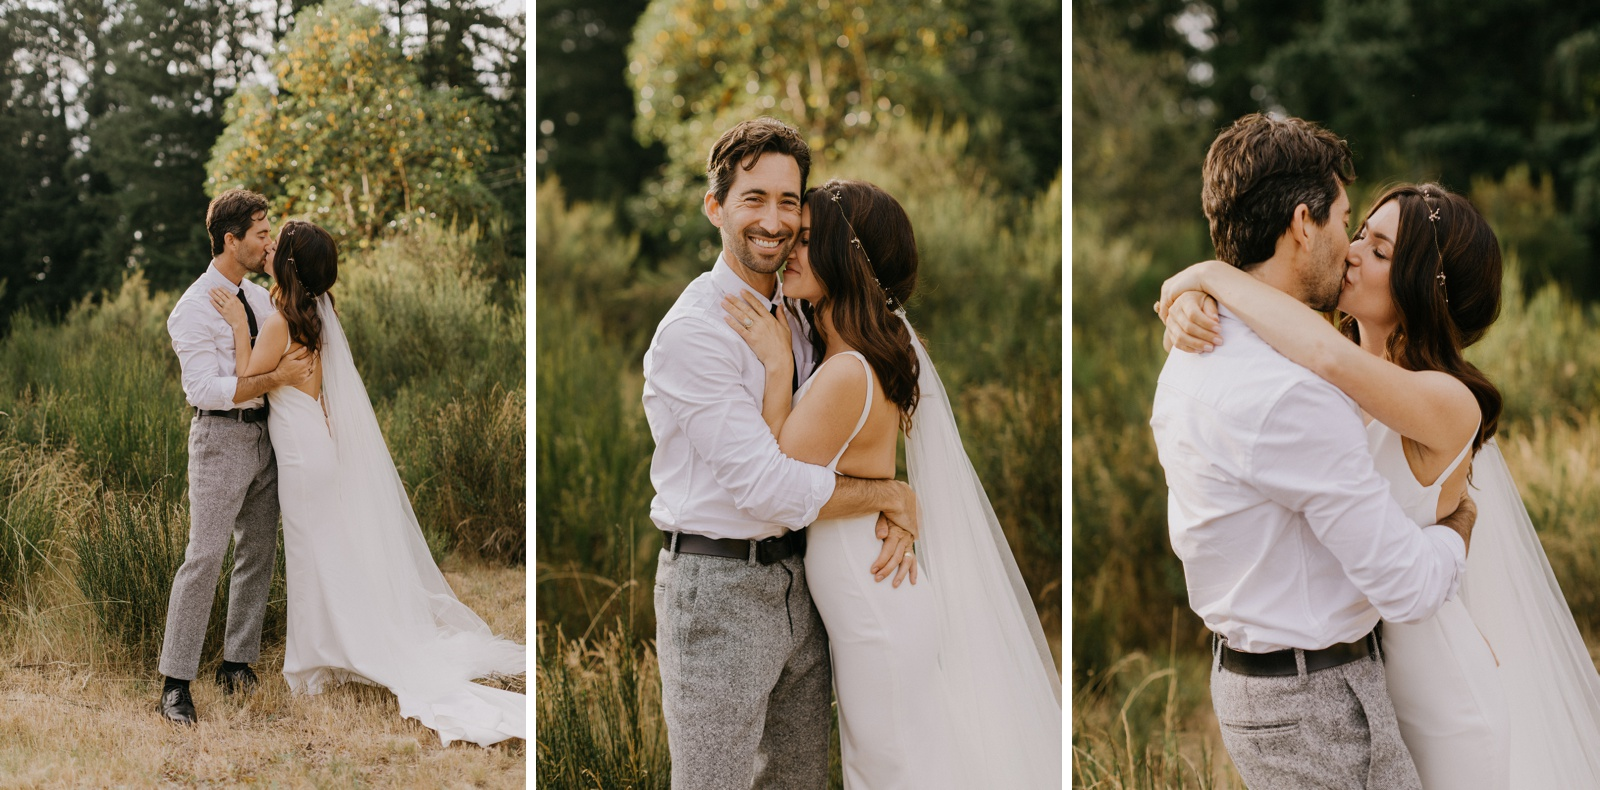 Matthew and Autumn Intimate Outdoor Backyard Wedding_0163